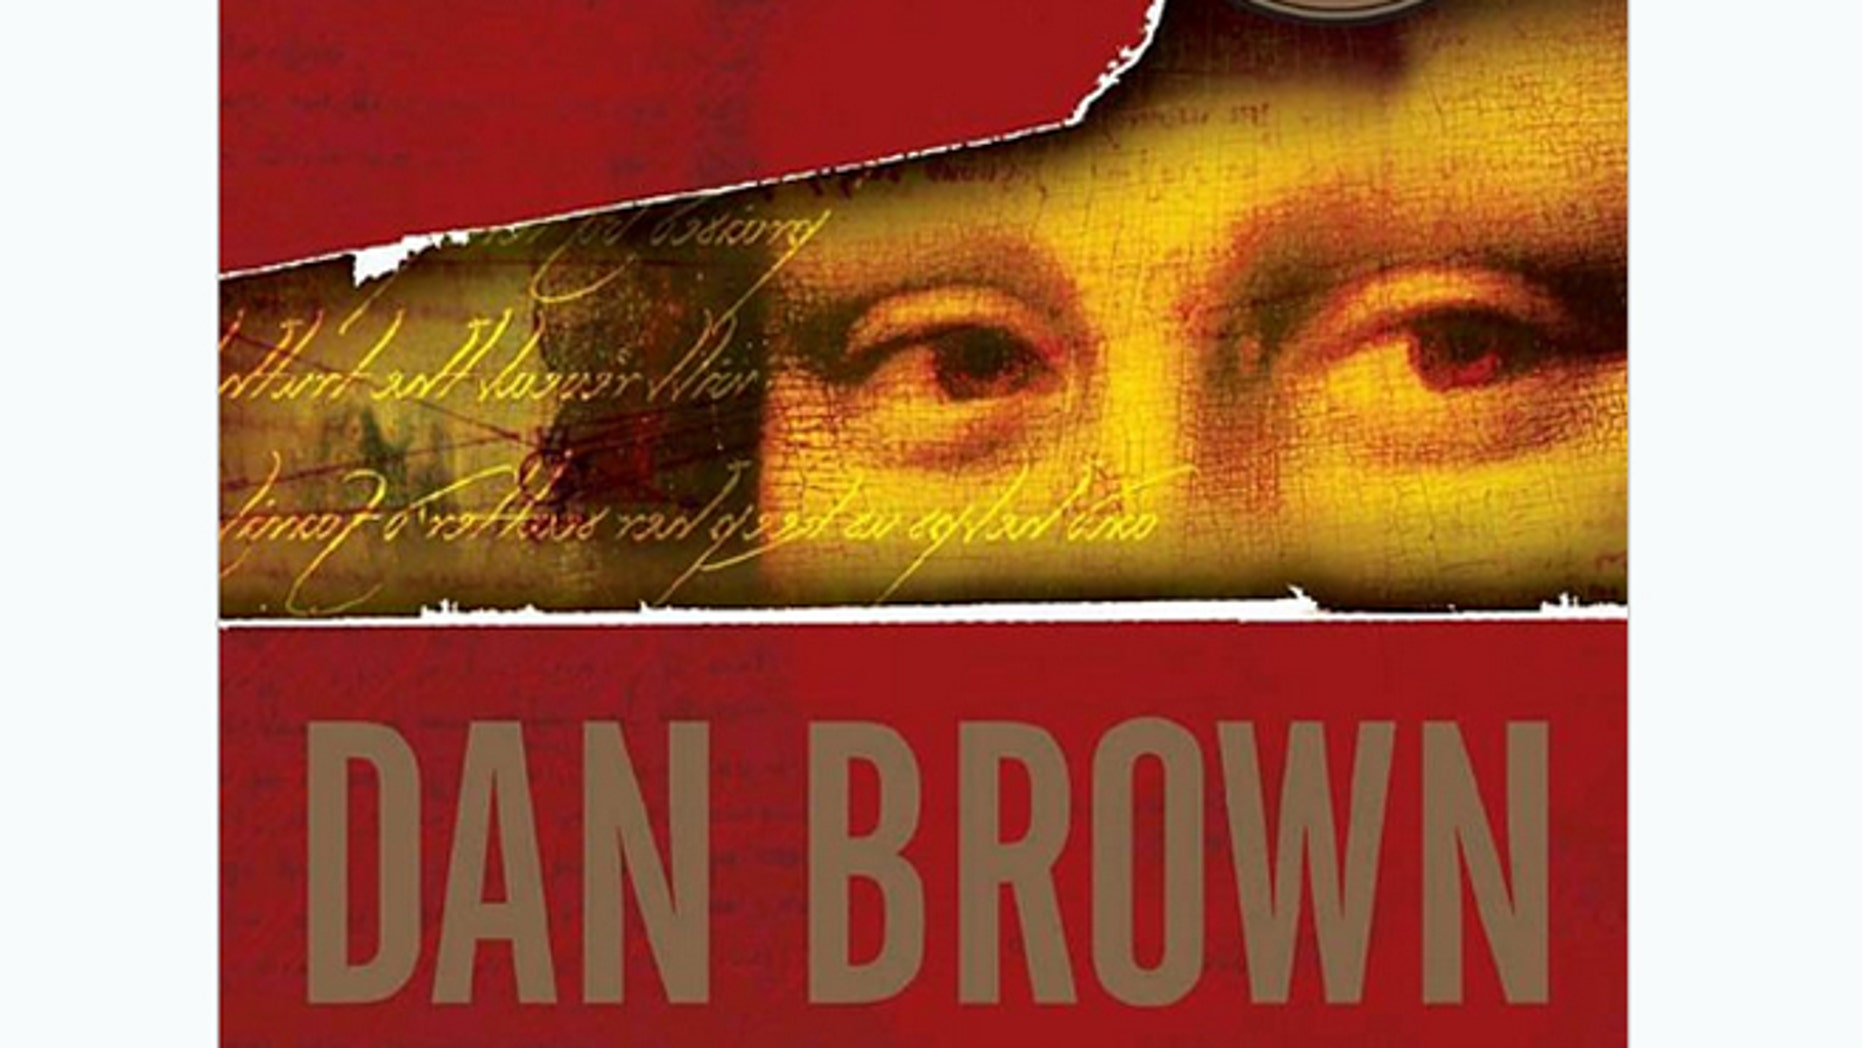 """The Da Vinci Code"" by Dan Brown."